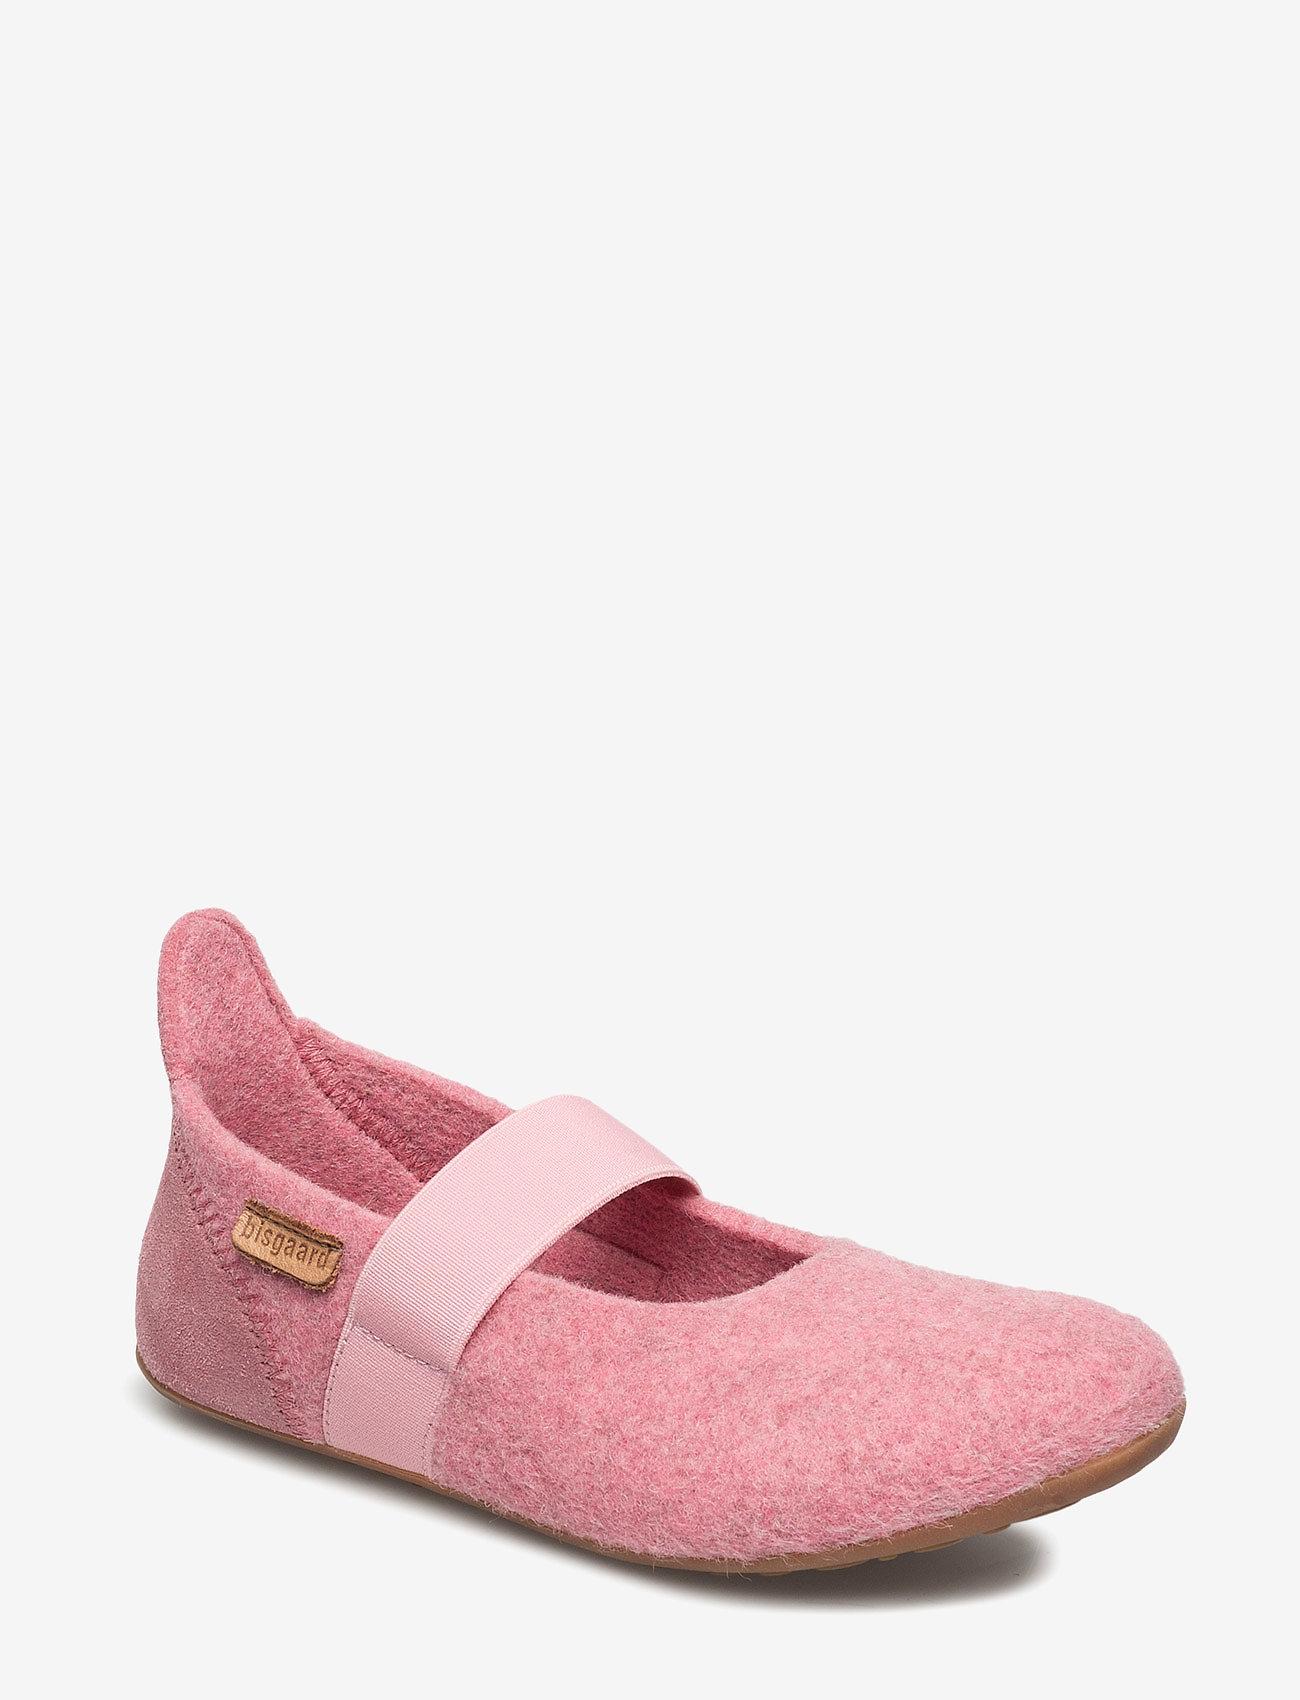 Bisgaard - bisgaard ballet wool - ballerinaer og slip-ons - 91 rosa - 0